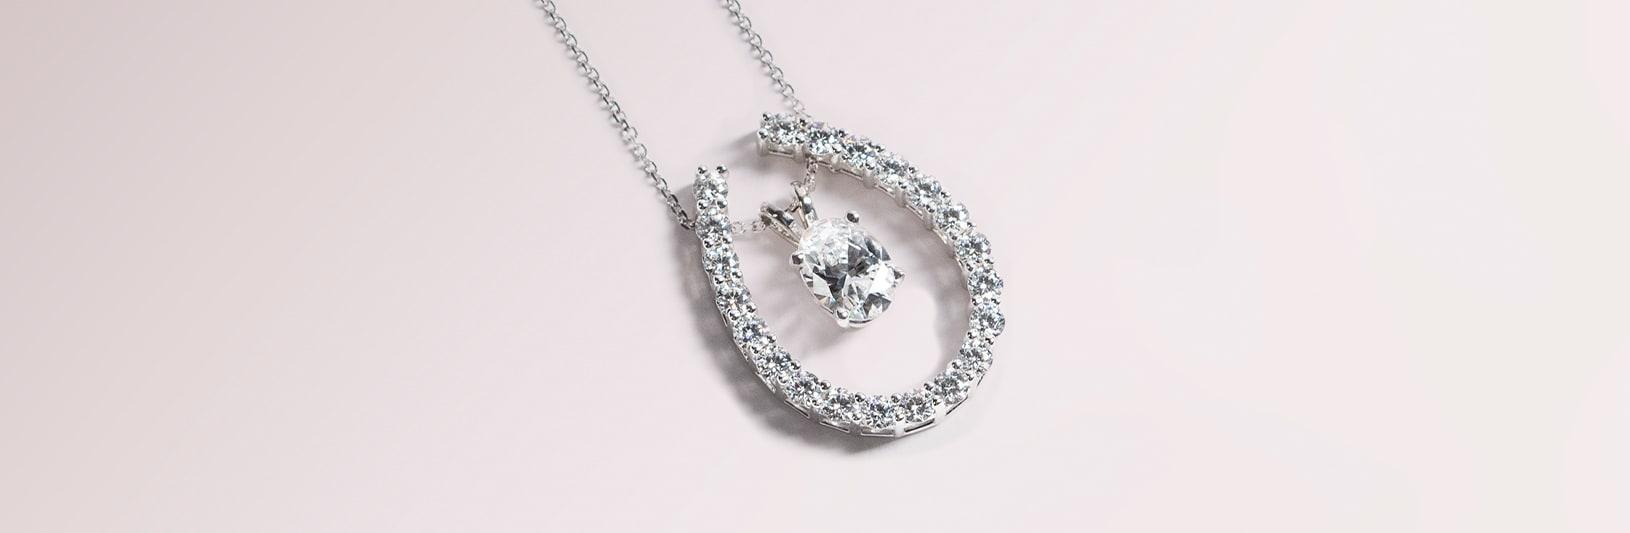 An elegant oval cut pendant